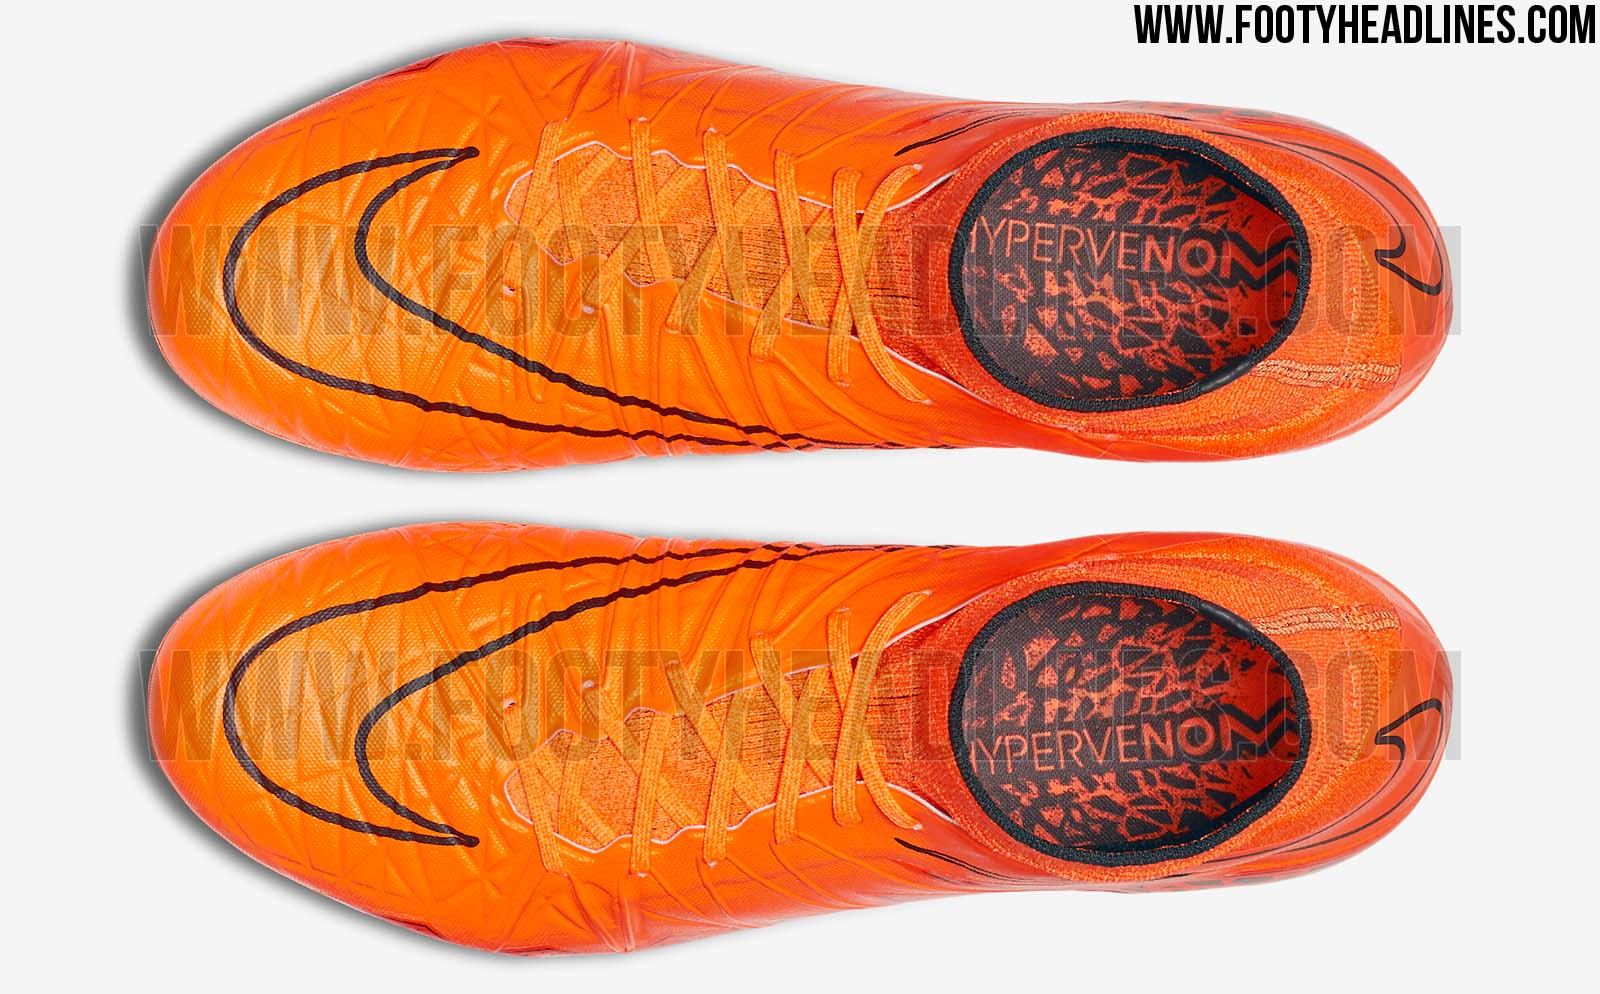 Orange Nike Hypervenom 2 2015 Boot Released - Footy Headlines